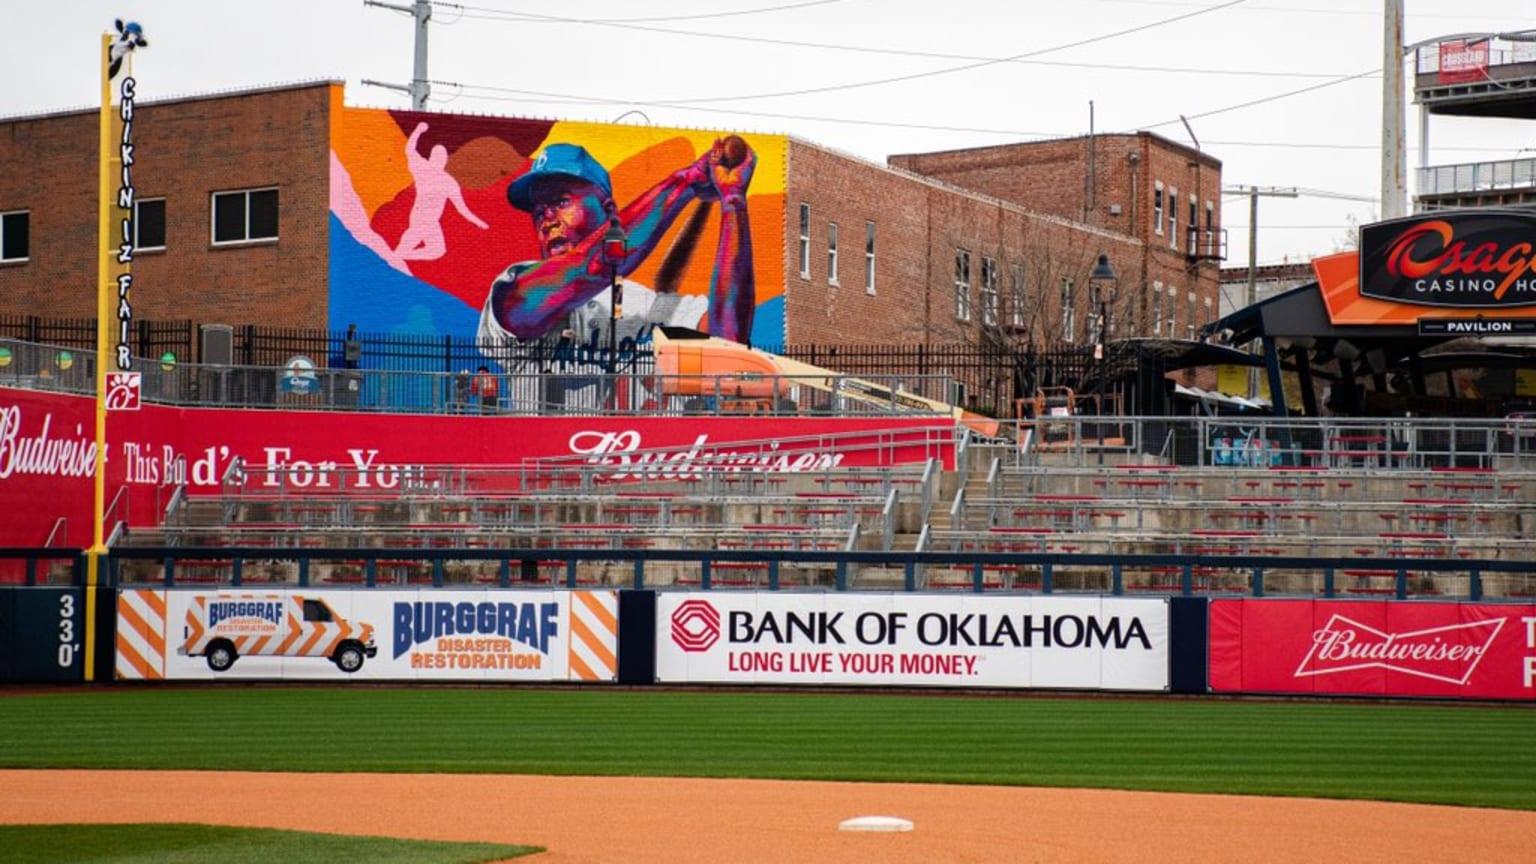 Marking Centennial of Tulsa Race Massacre, Tulsa Drillers Unveil New Jackie Robinson Mural on Site